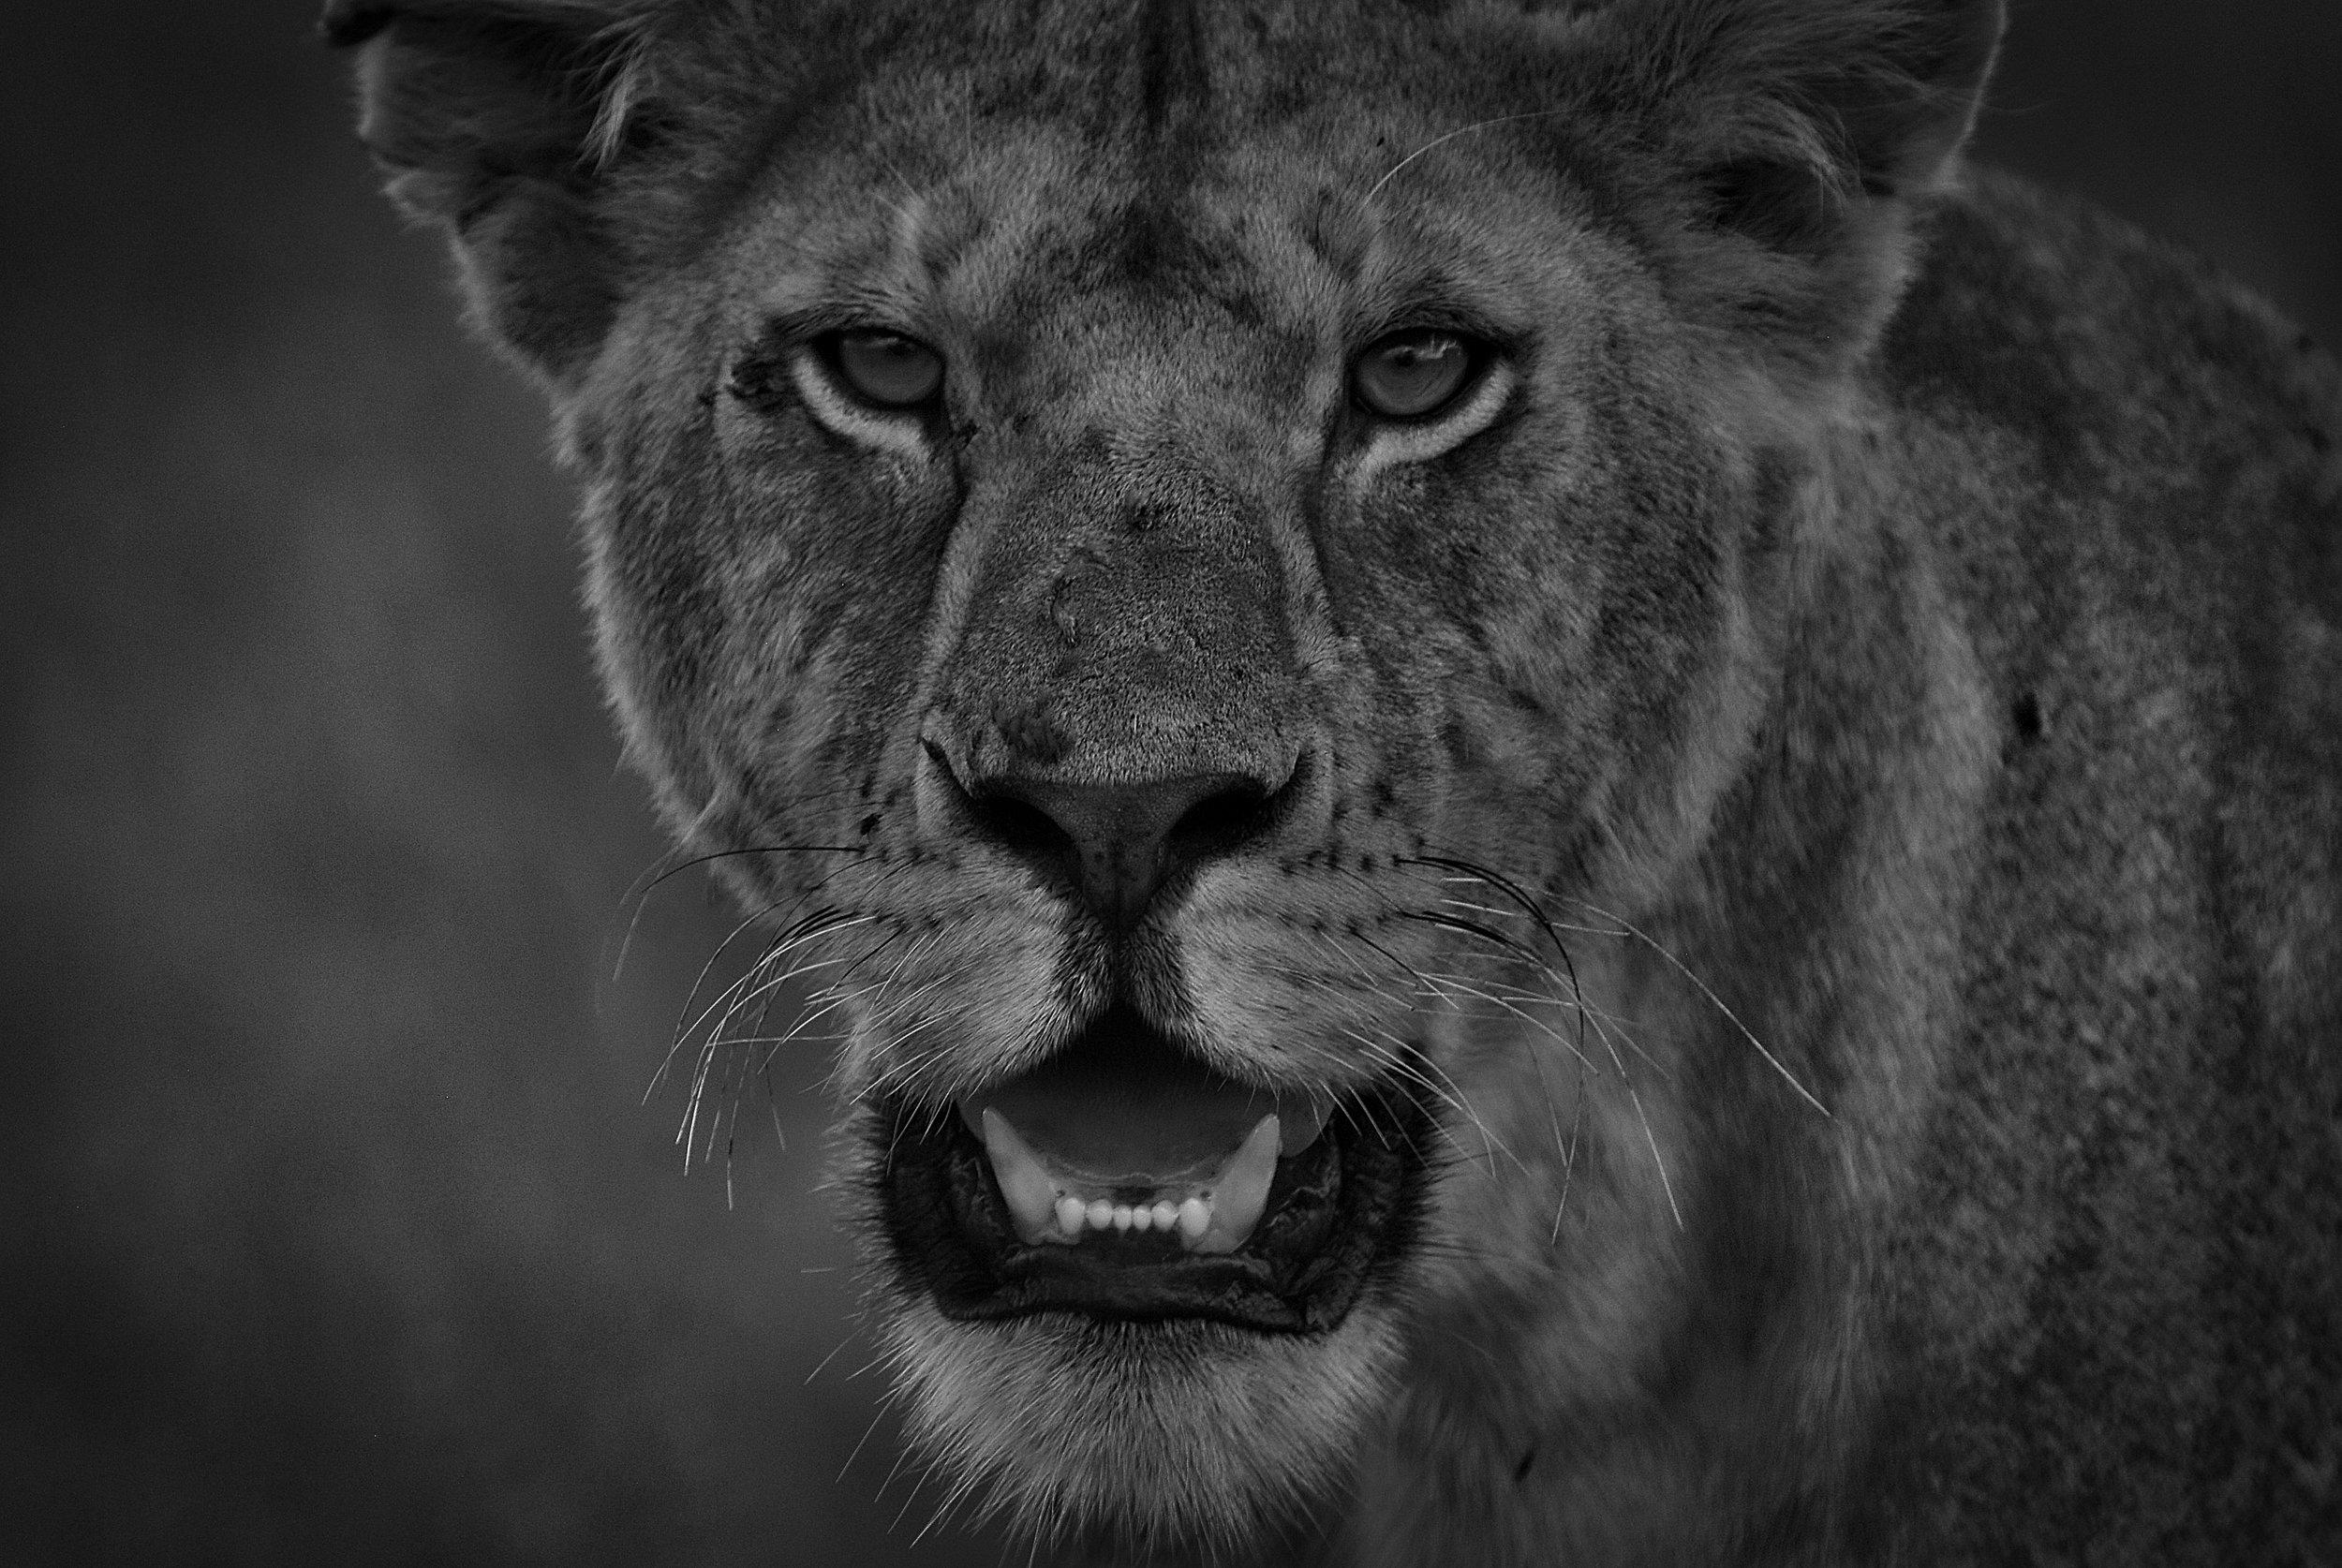 Lioness, Serengeti National Park, Tanzania.